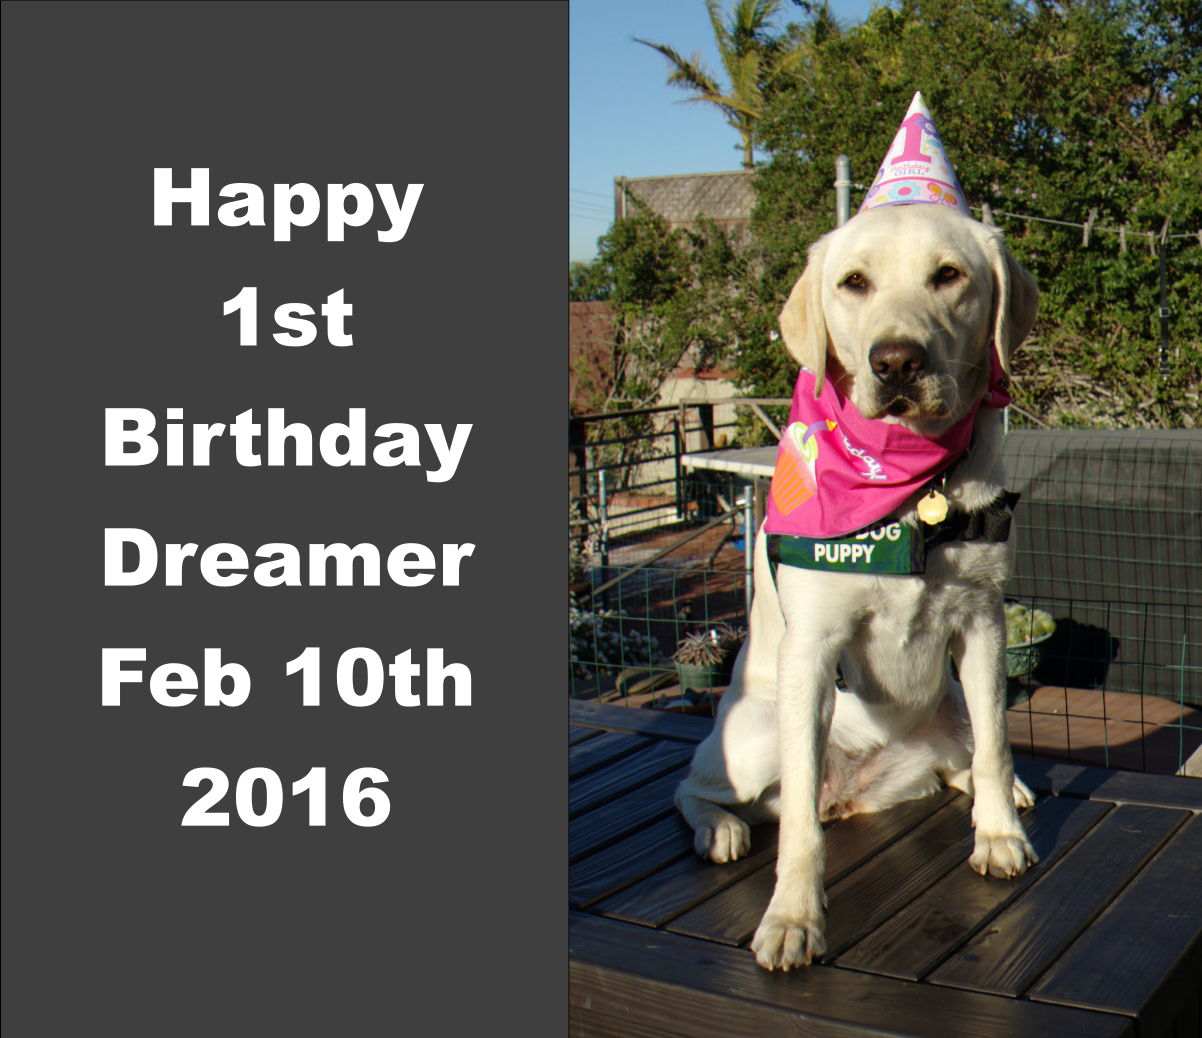 Dreamer 1st birthday